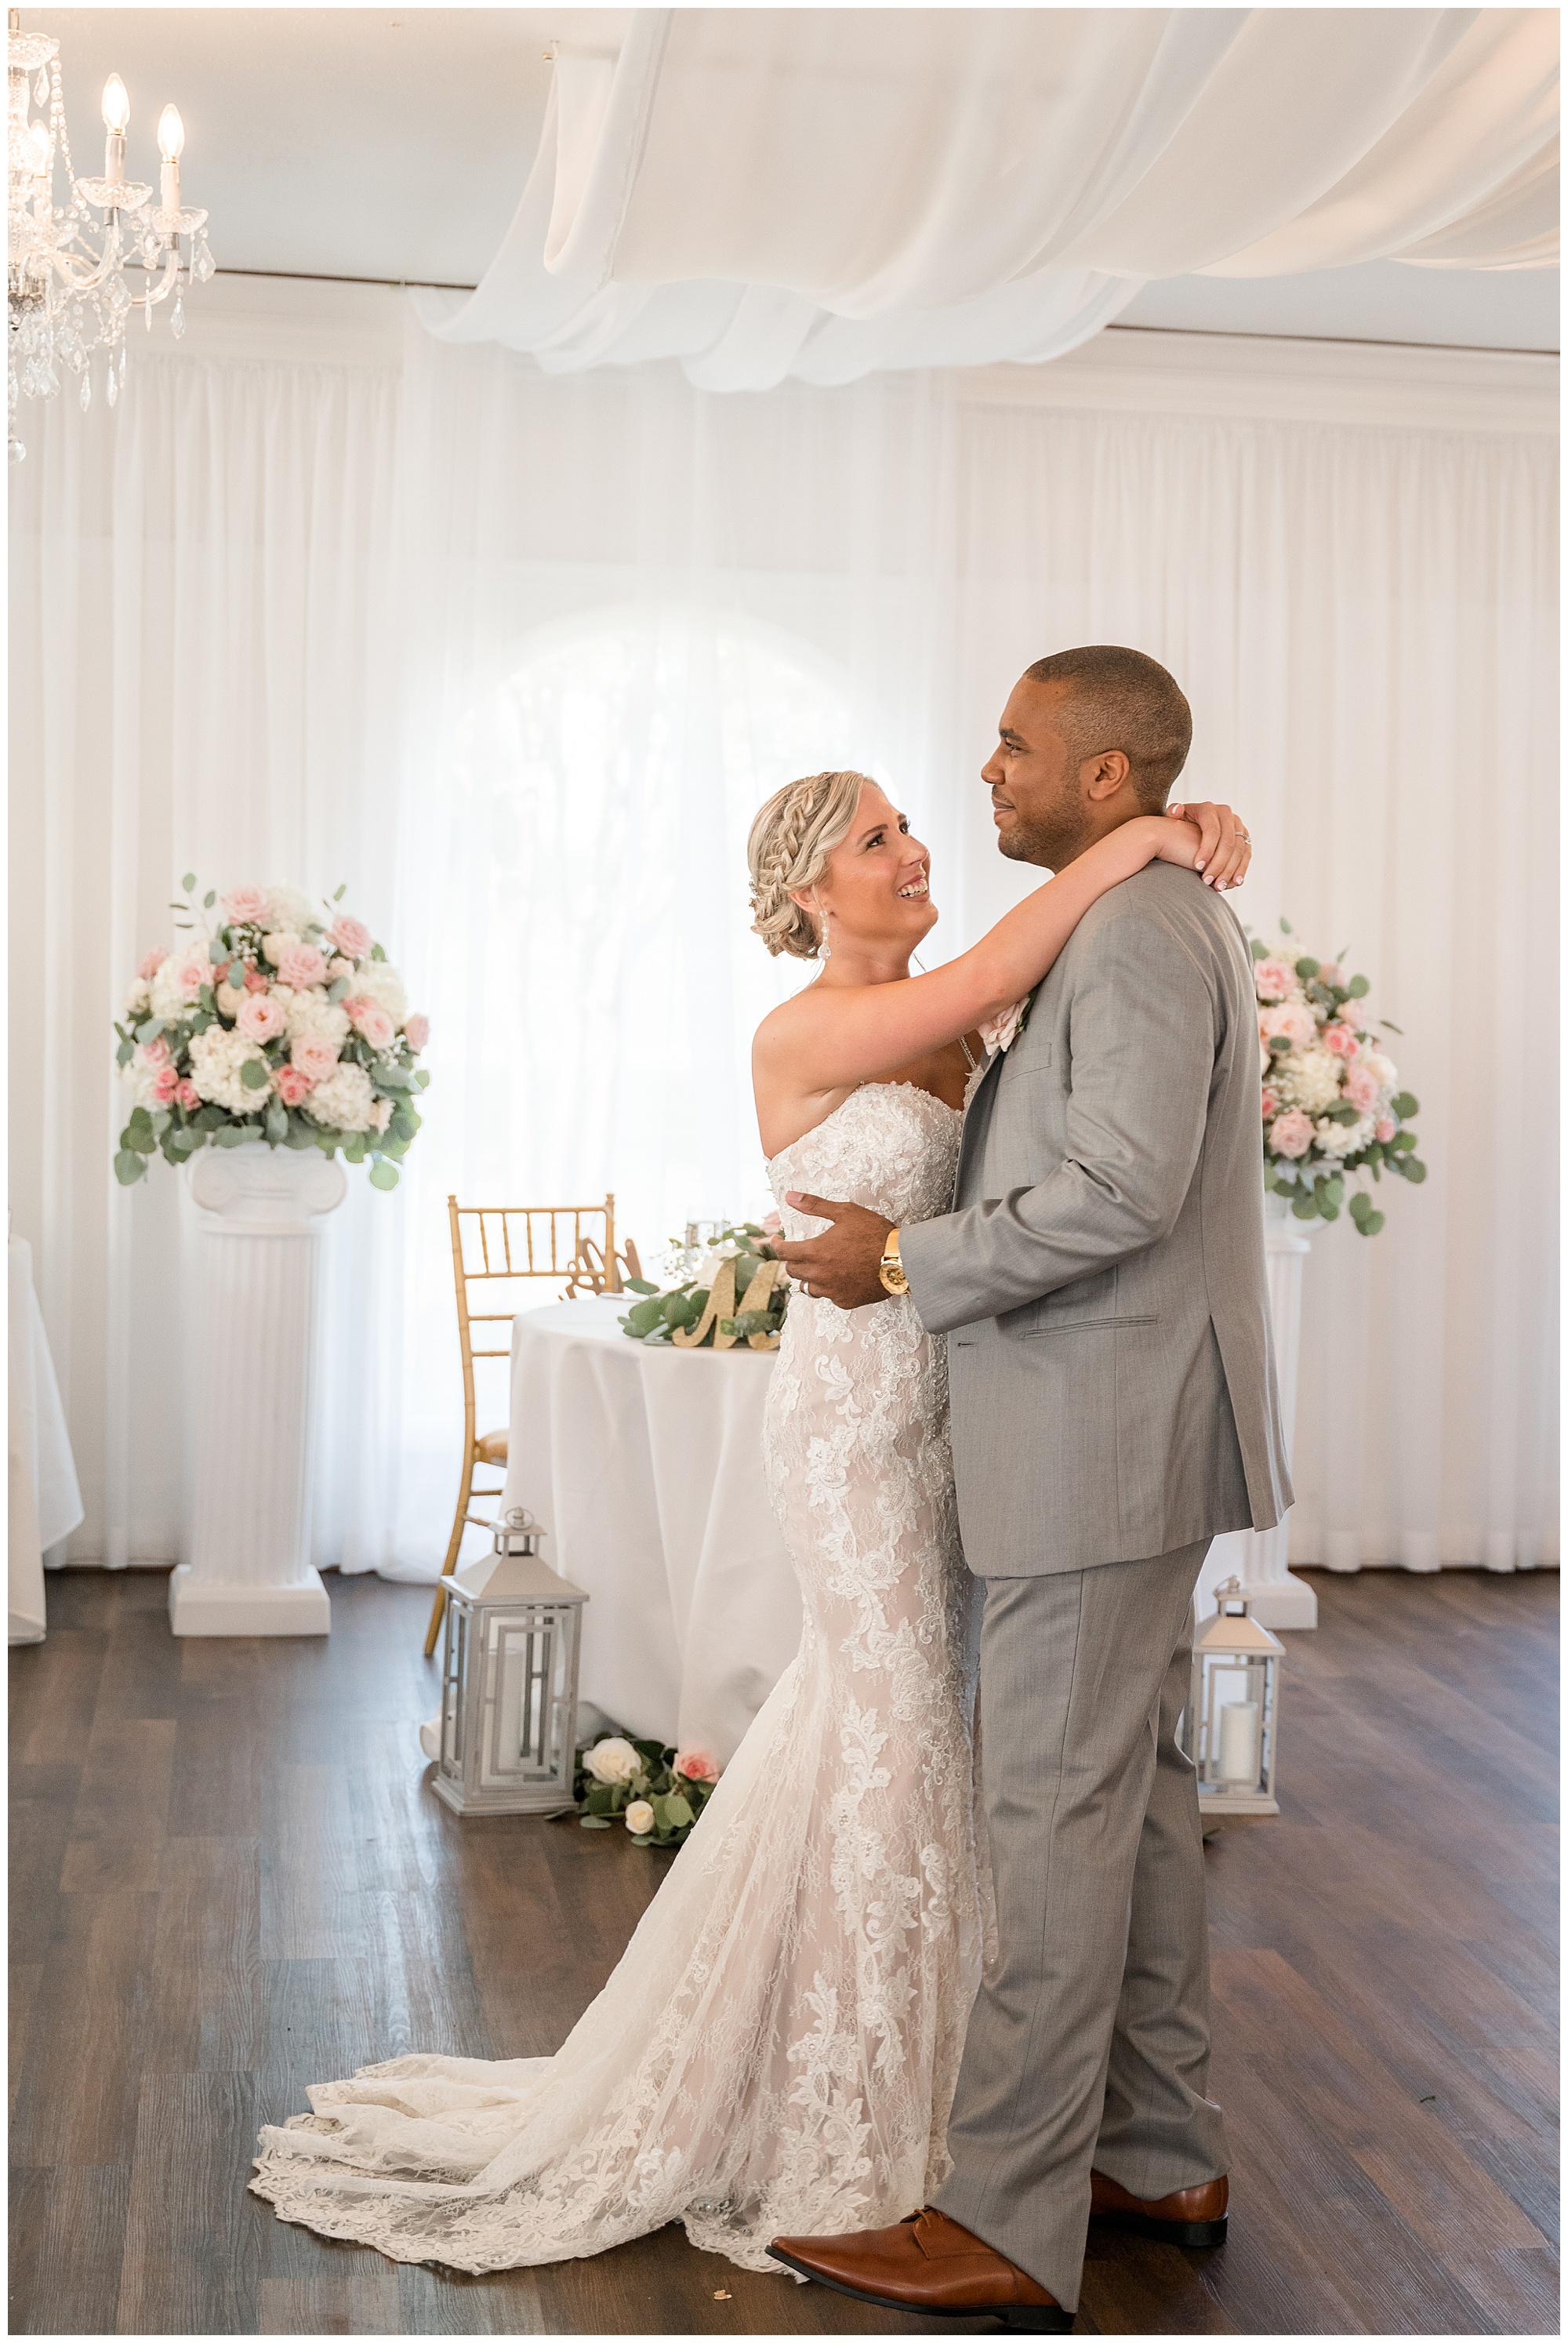 Bristow Manor wedding photographer